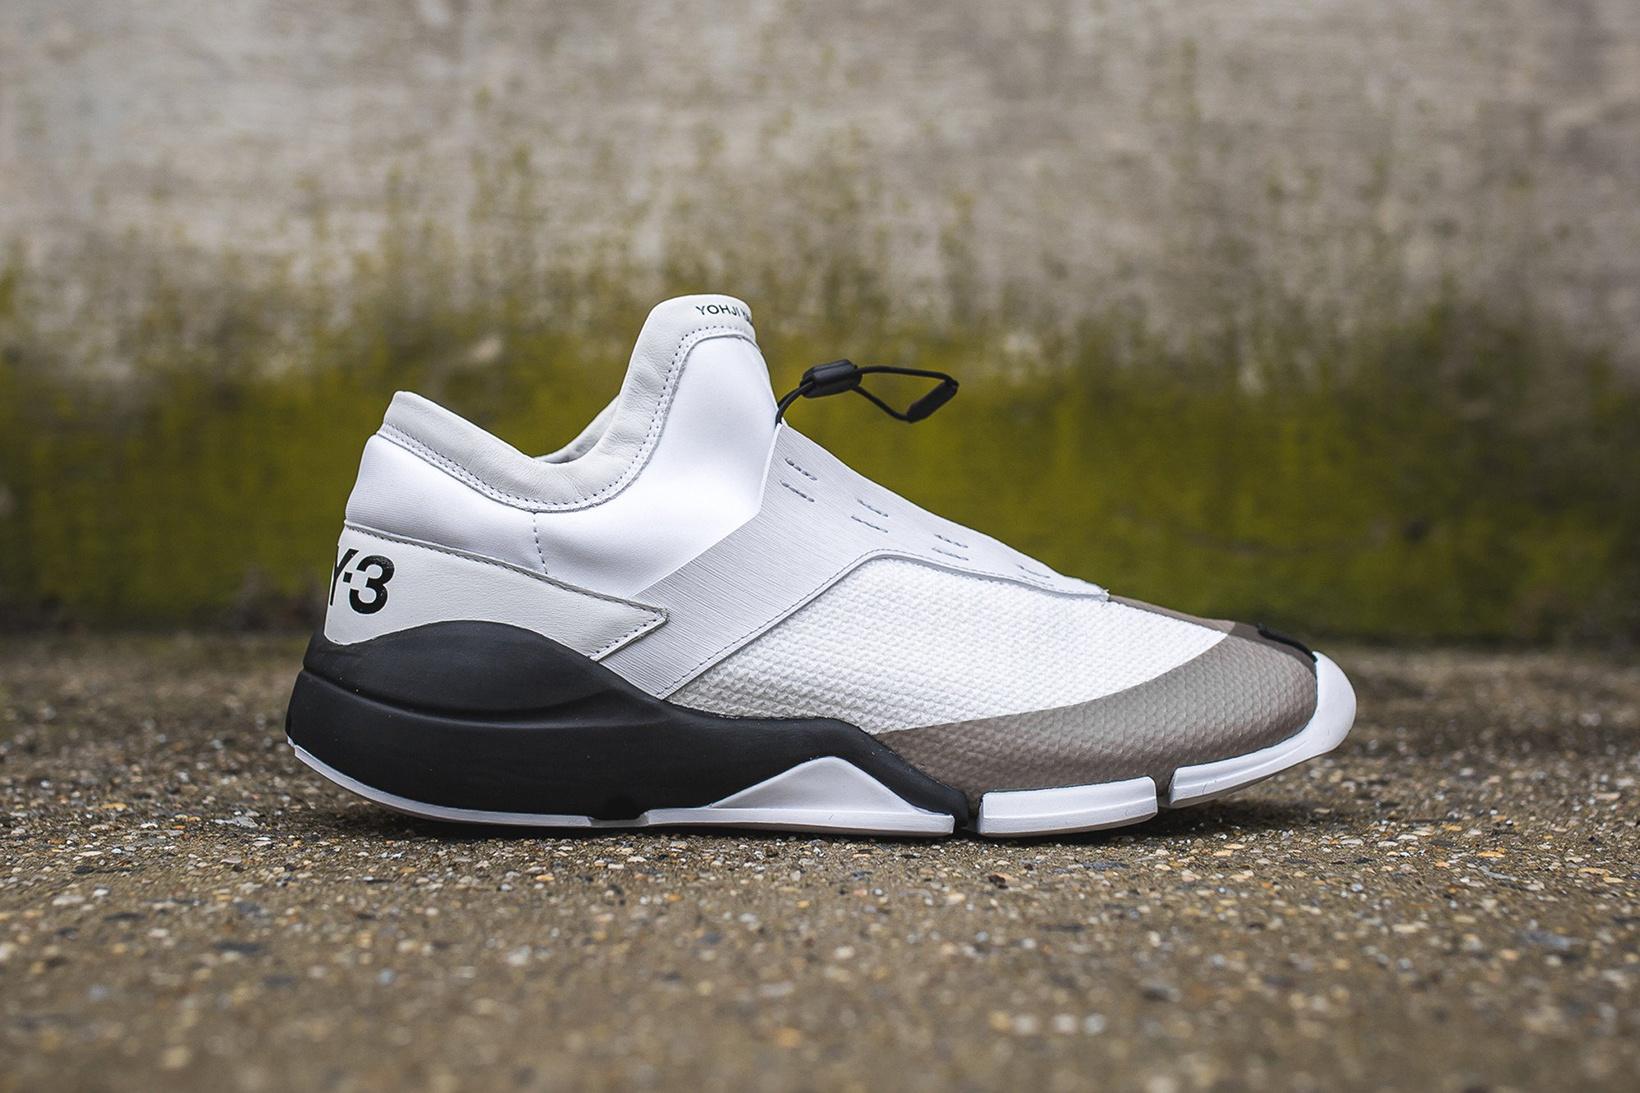 y3-future-low-white-core-black-1